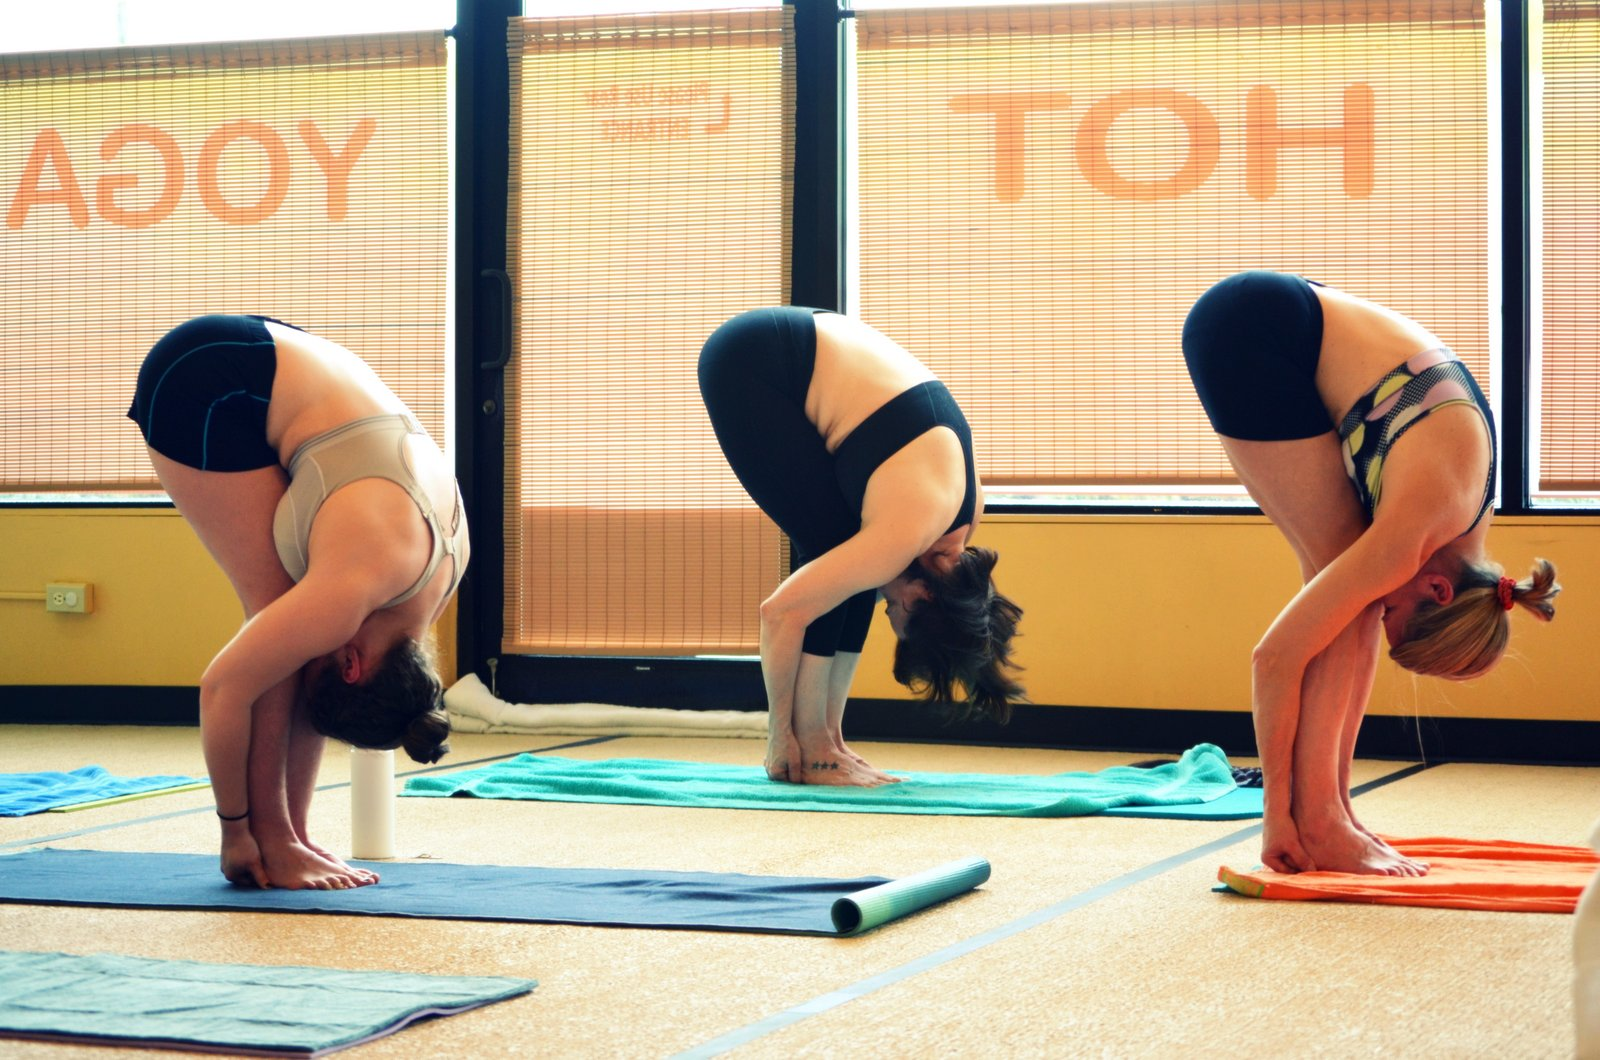 How does one attain moksha through Jnana-yoga? 5